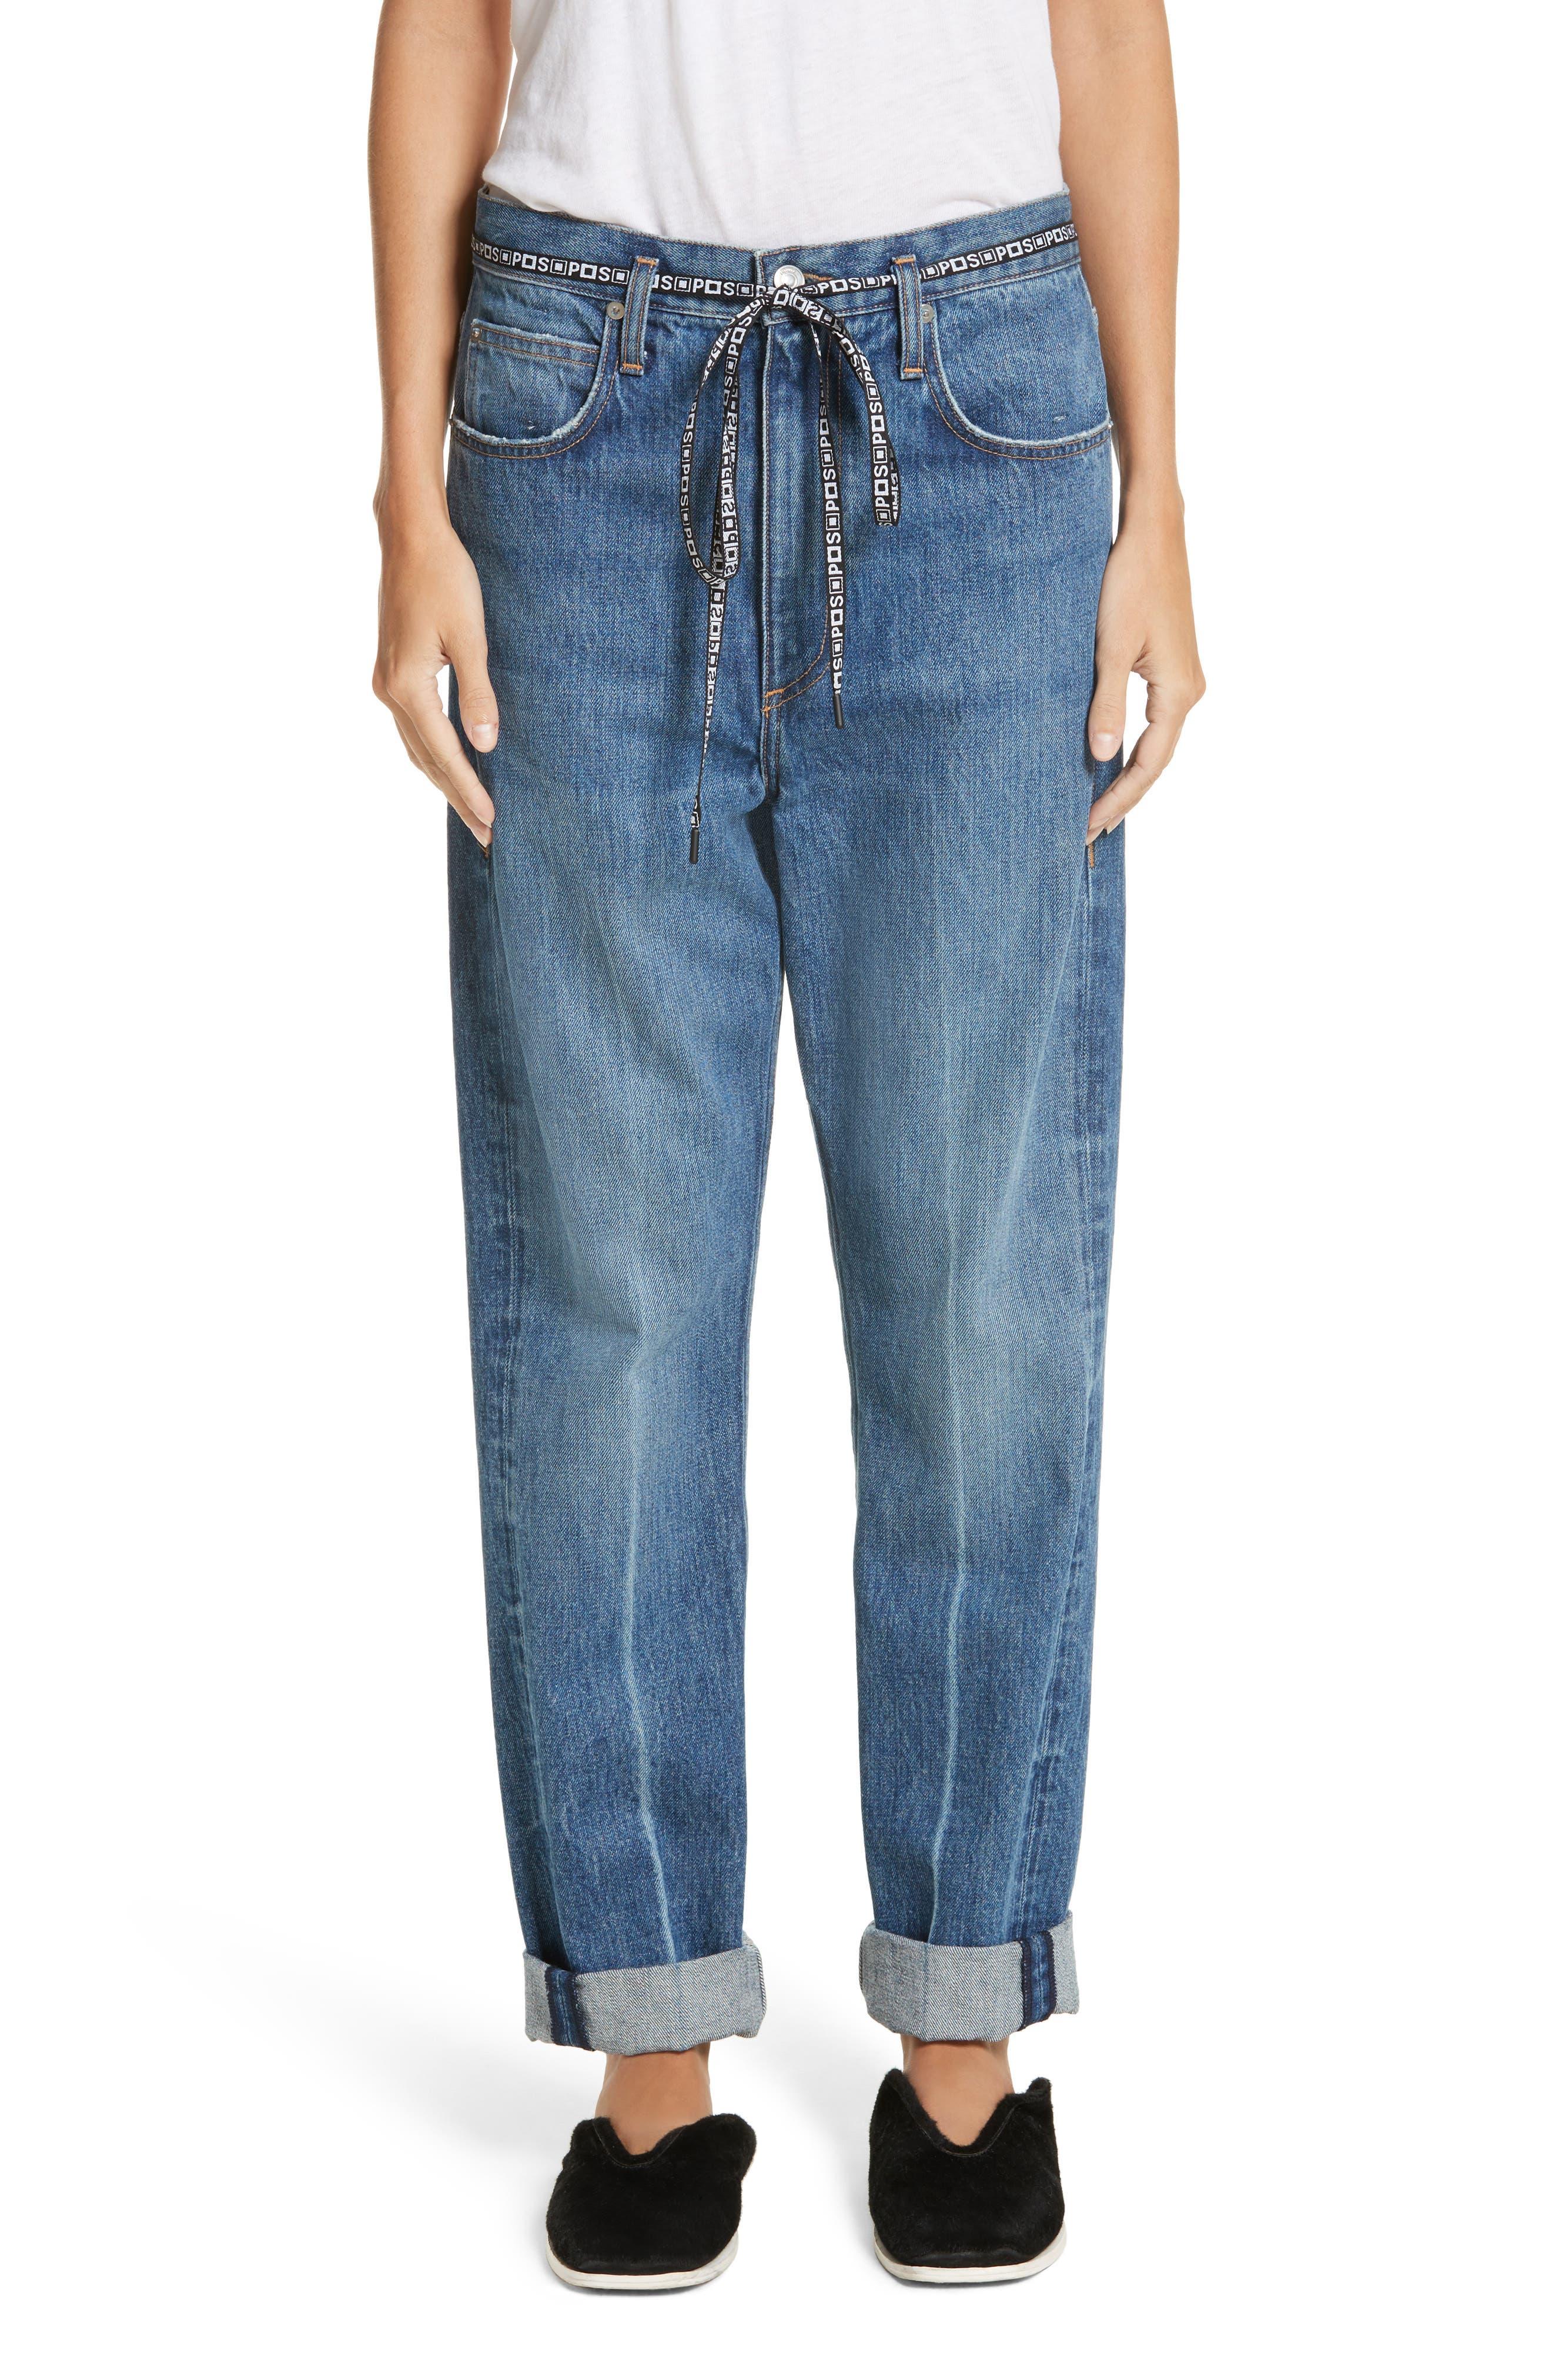 PSWL Cuffed Straight Leg Jeans,                             Main thumbnail 1, color,                             Medium Blue